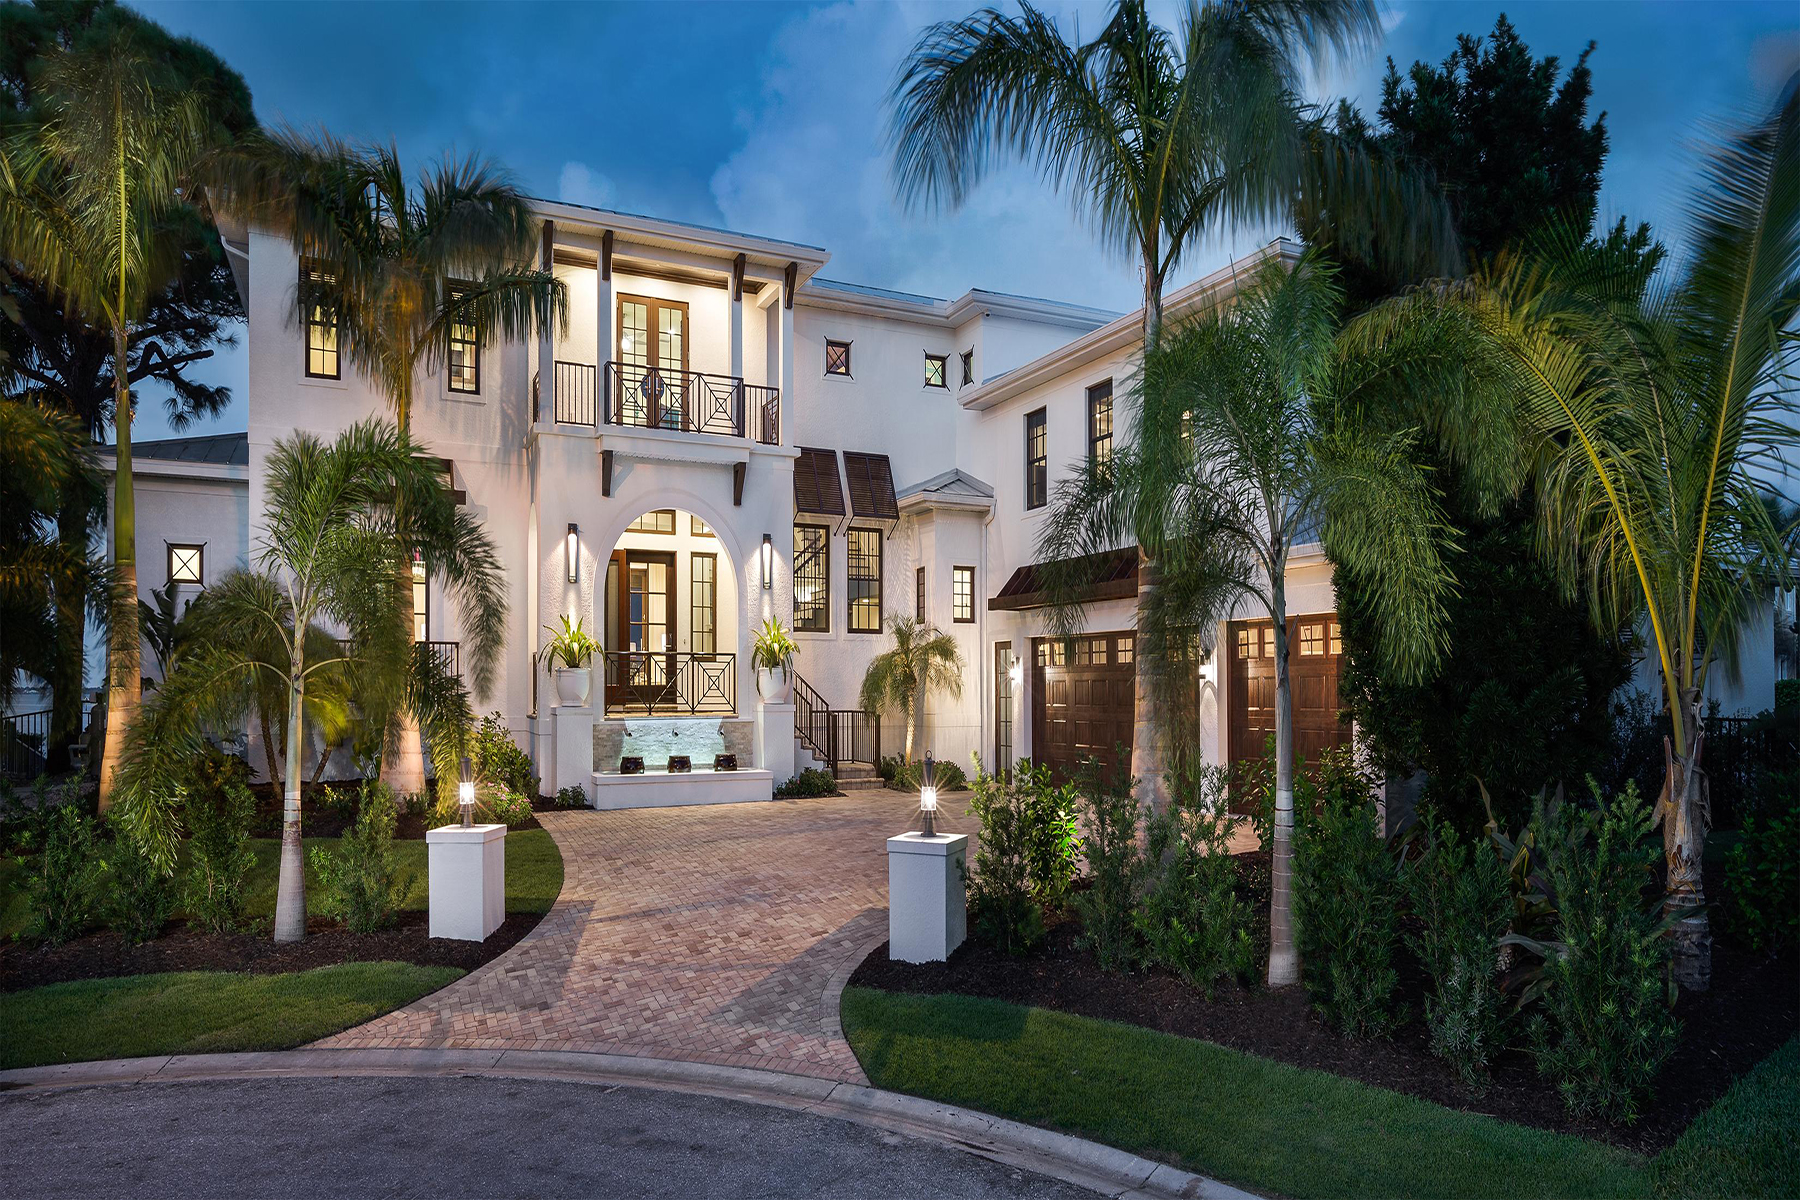 Single Family Homes for Active at 711 Casey Key Rd Nokomis, Florida 34275 United States